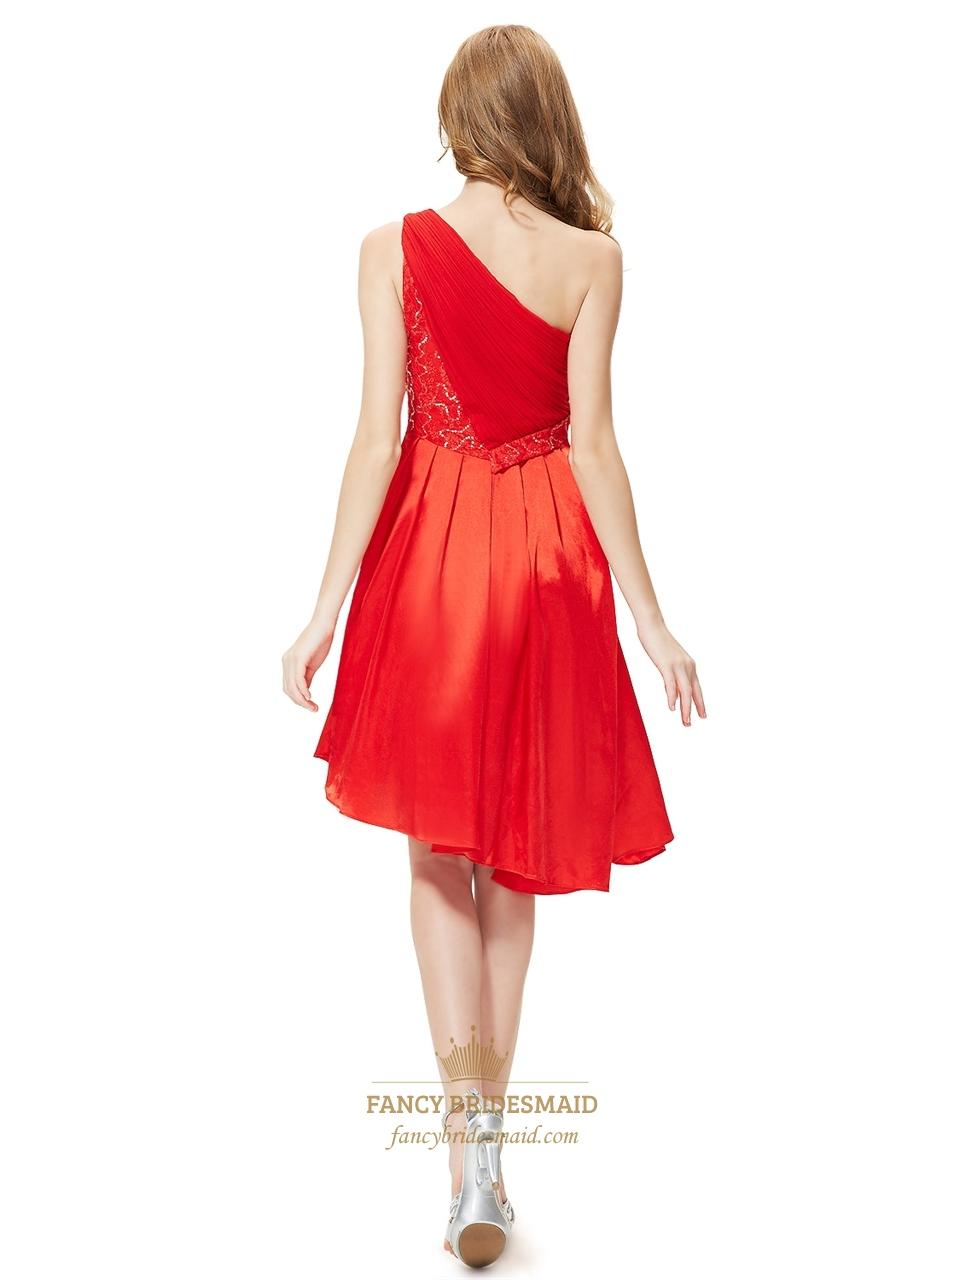 Red one shoulder short asymmetrical hem bridesmaid dresses for Wedding dresses asymmetrical hemline